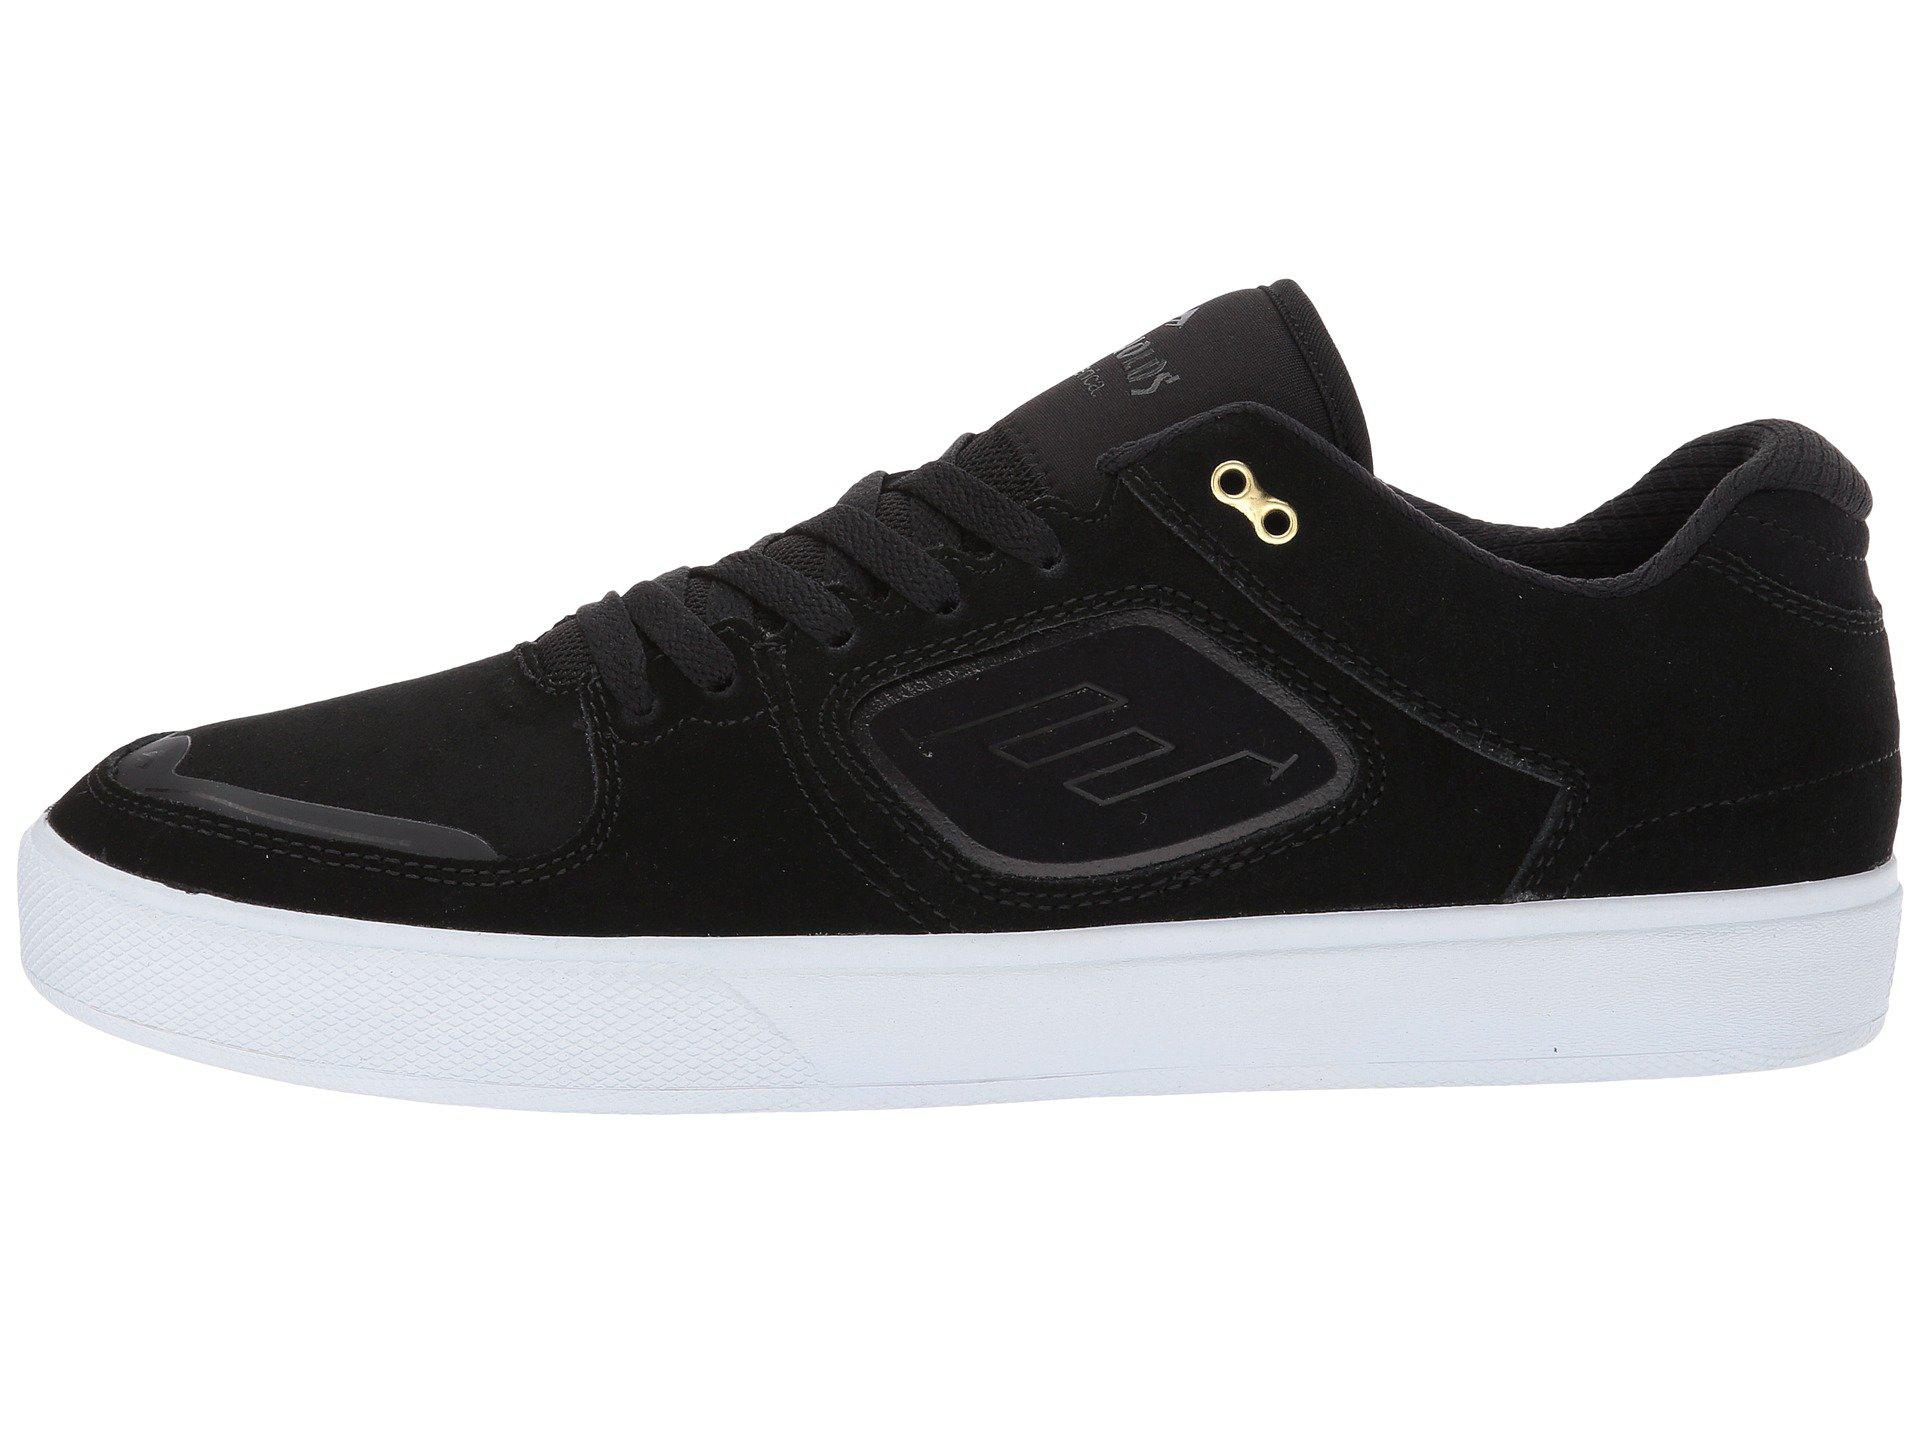 Emerica Mens Skate Shoes Reynolds G6 Black Gum